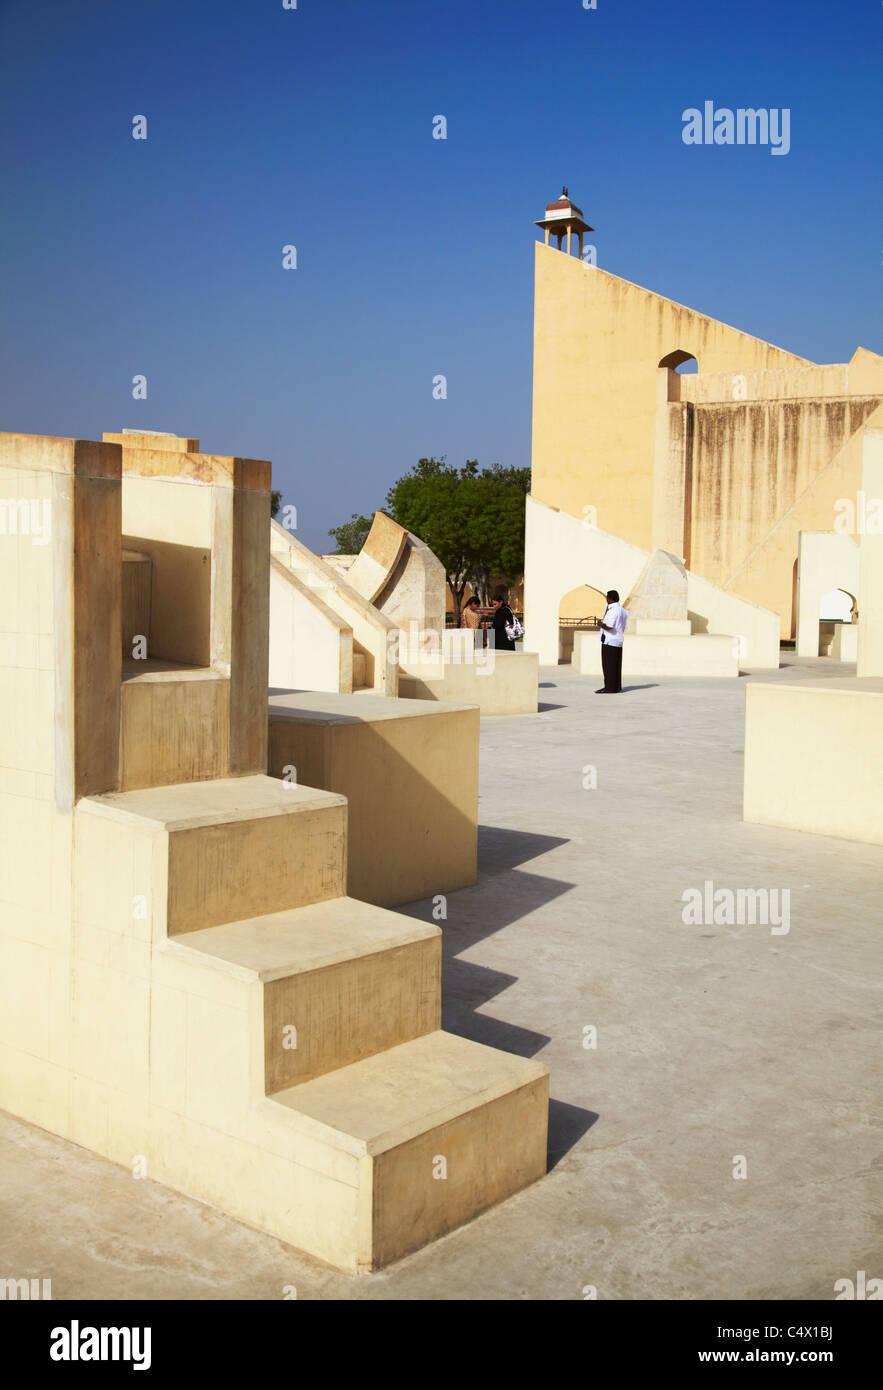 Strumento astronomico a Jantar Mantar (Patrimonio Mondiale dell'UNESCO), Jaipur, Rajasthan, India Immagini Stock